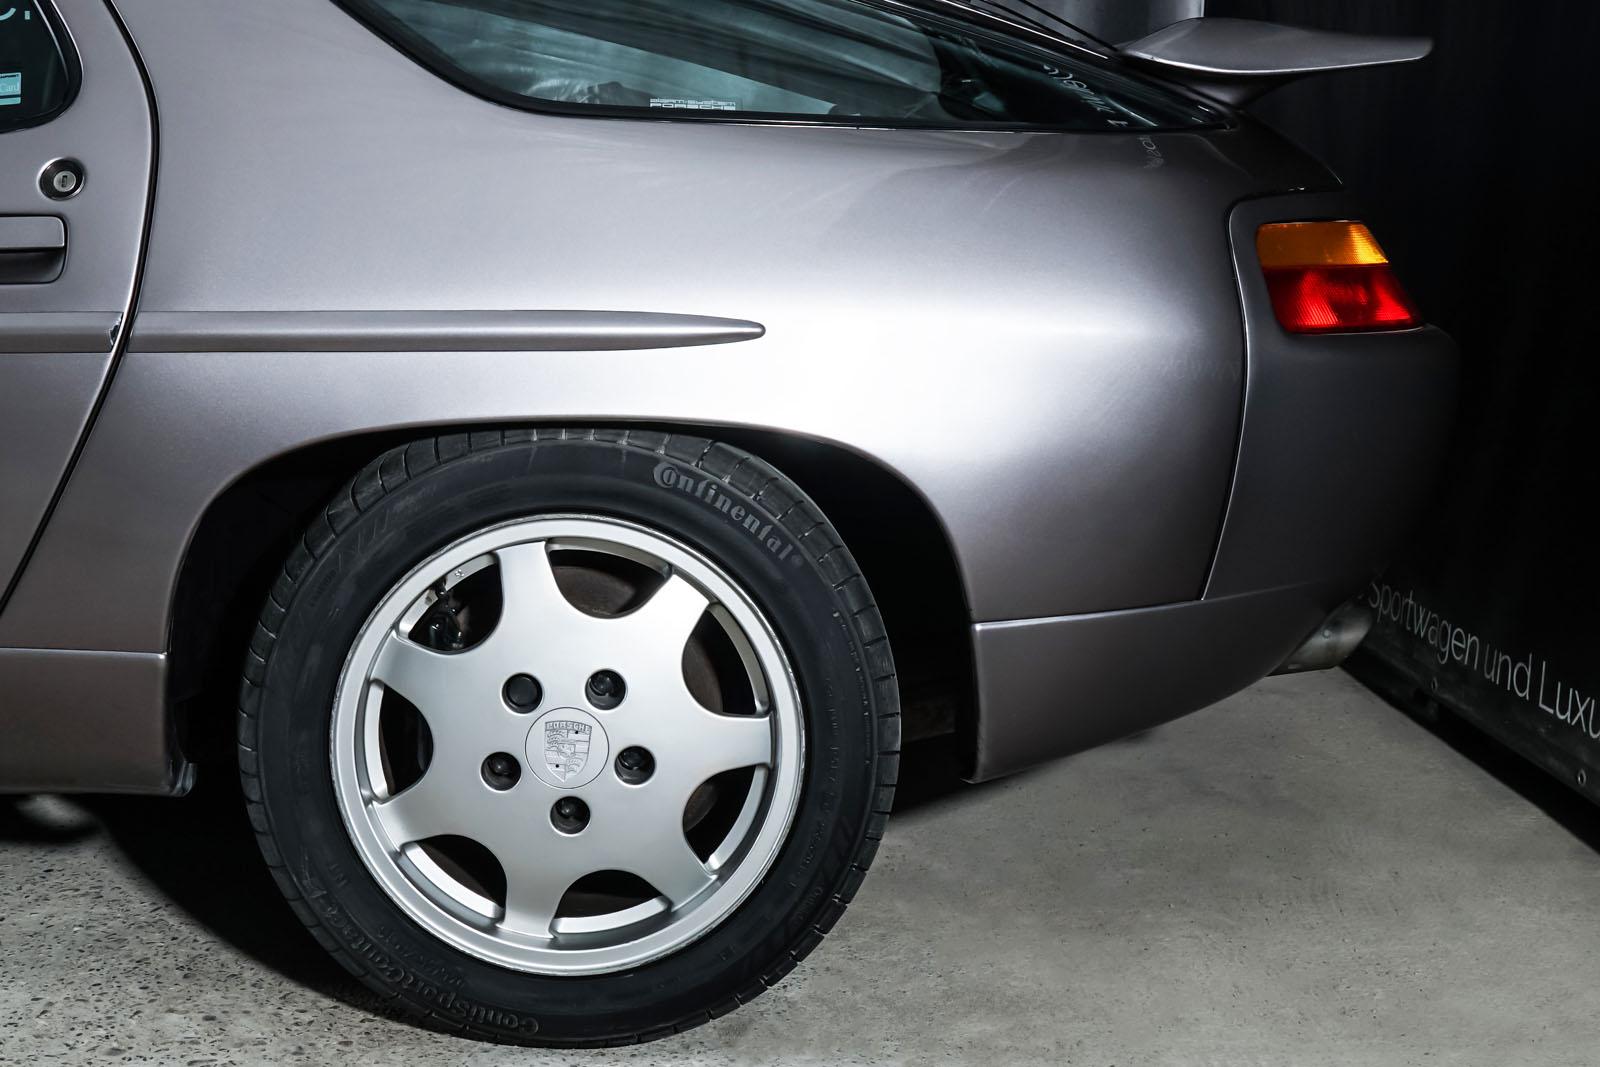 Porsche_928_Grau_Schwarz_POR-0325_4_w